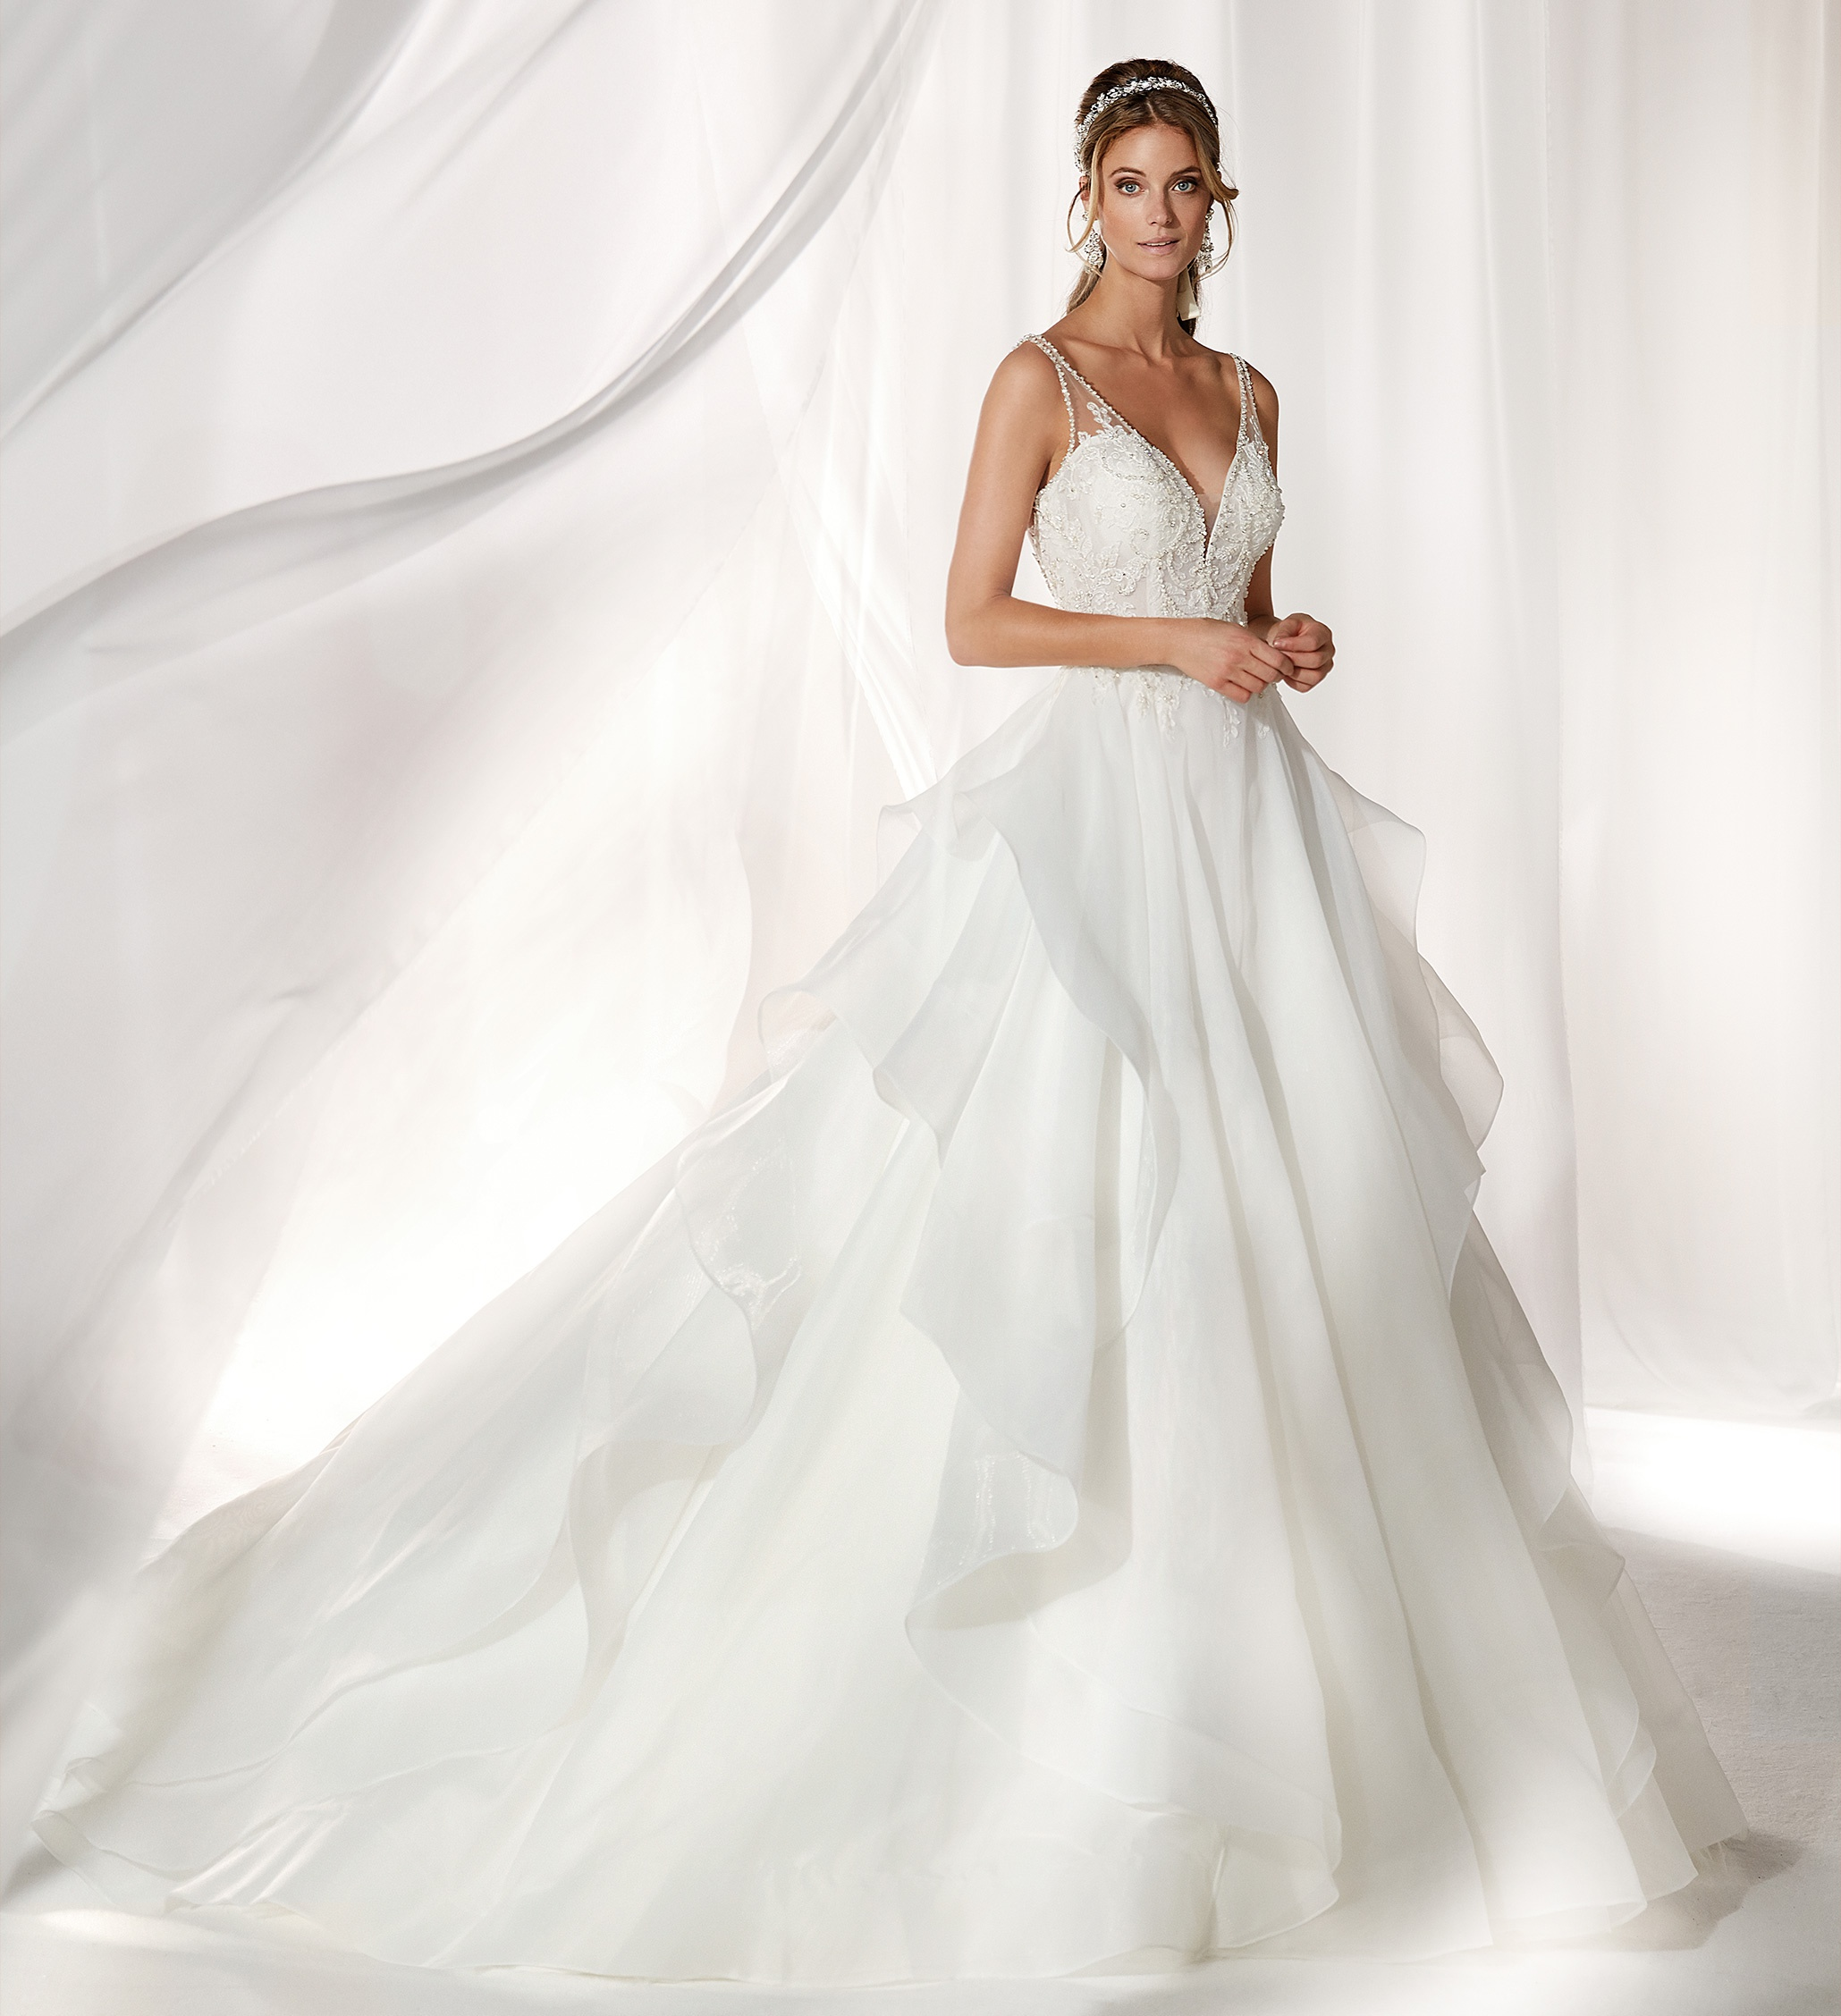 nicole-spose-NIAB19137-Nicole-moda-sposa-2019-465